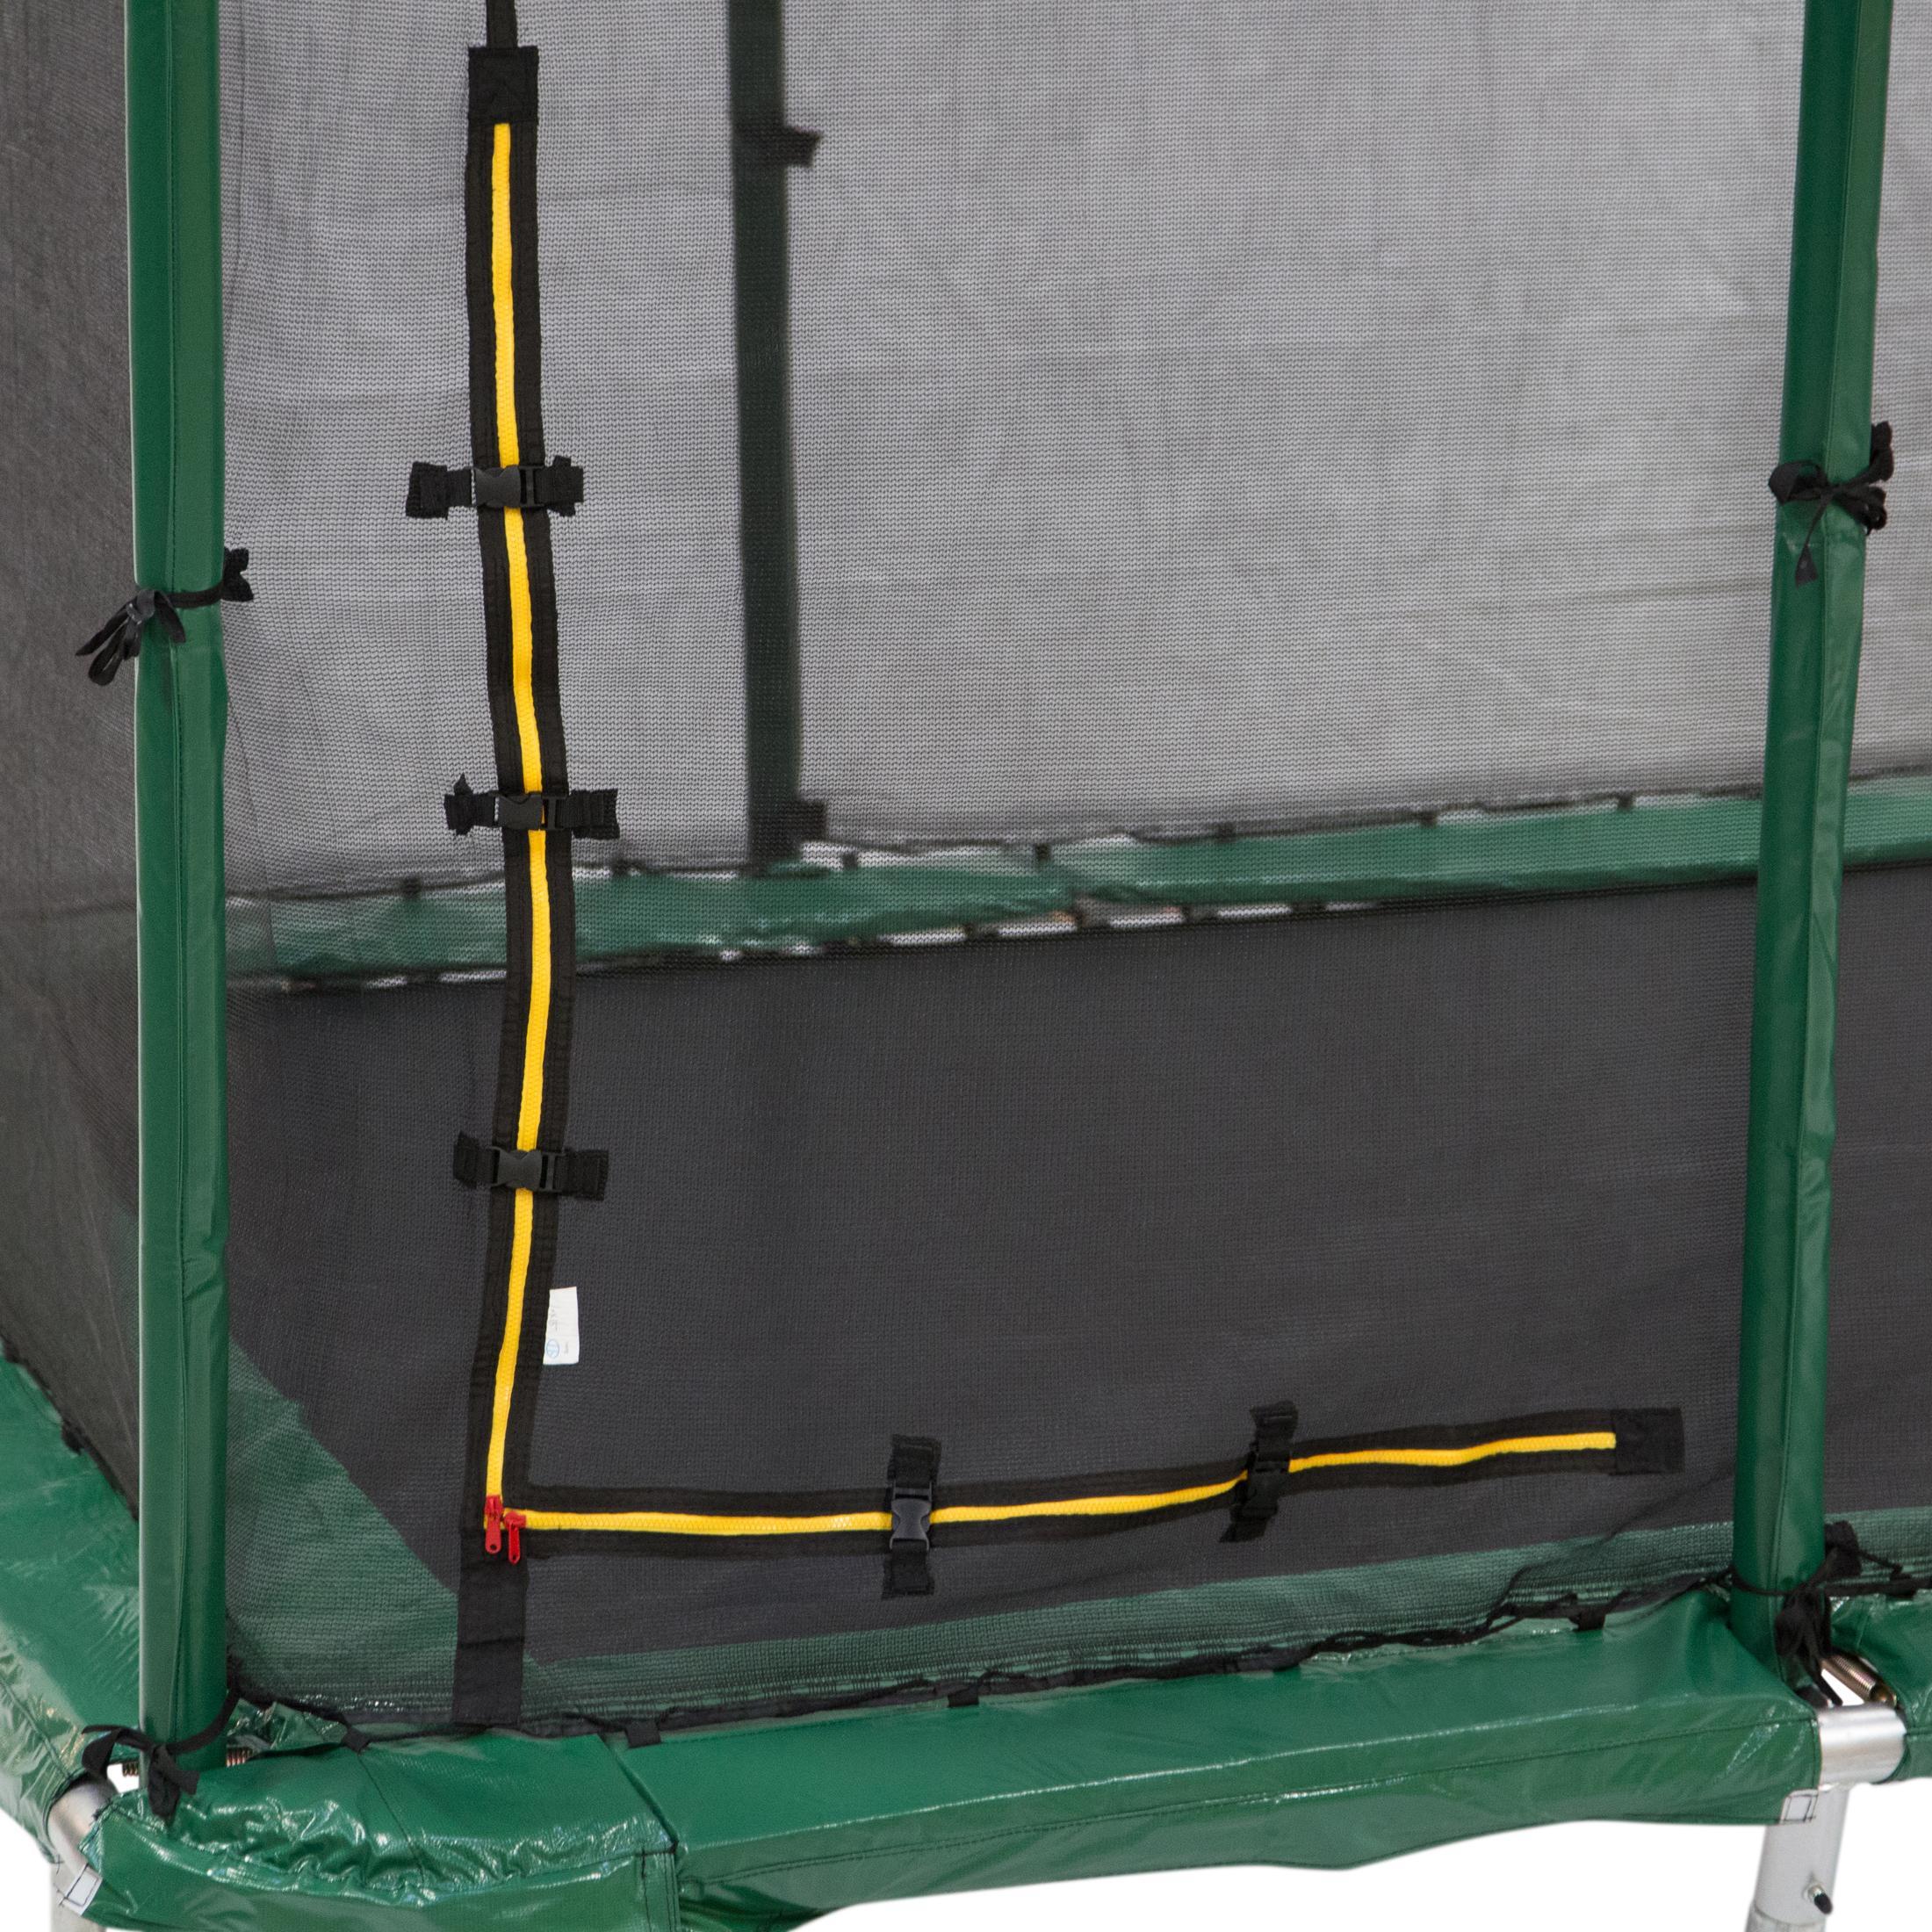 Ultrasport Premium Jumper Garden Trampoline 10 X 15 Ft